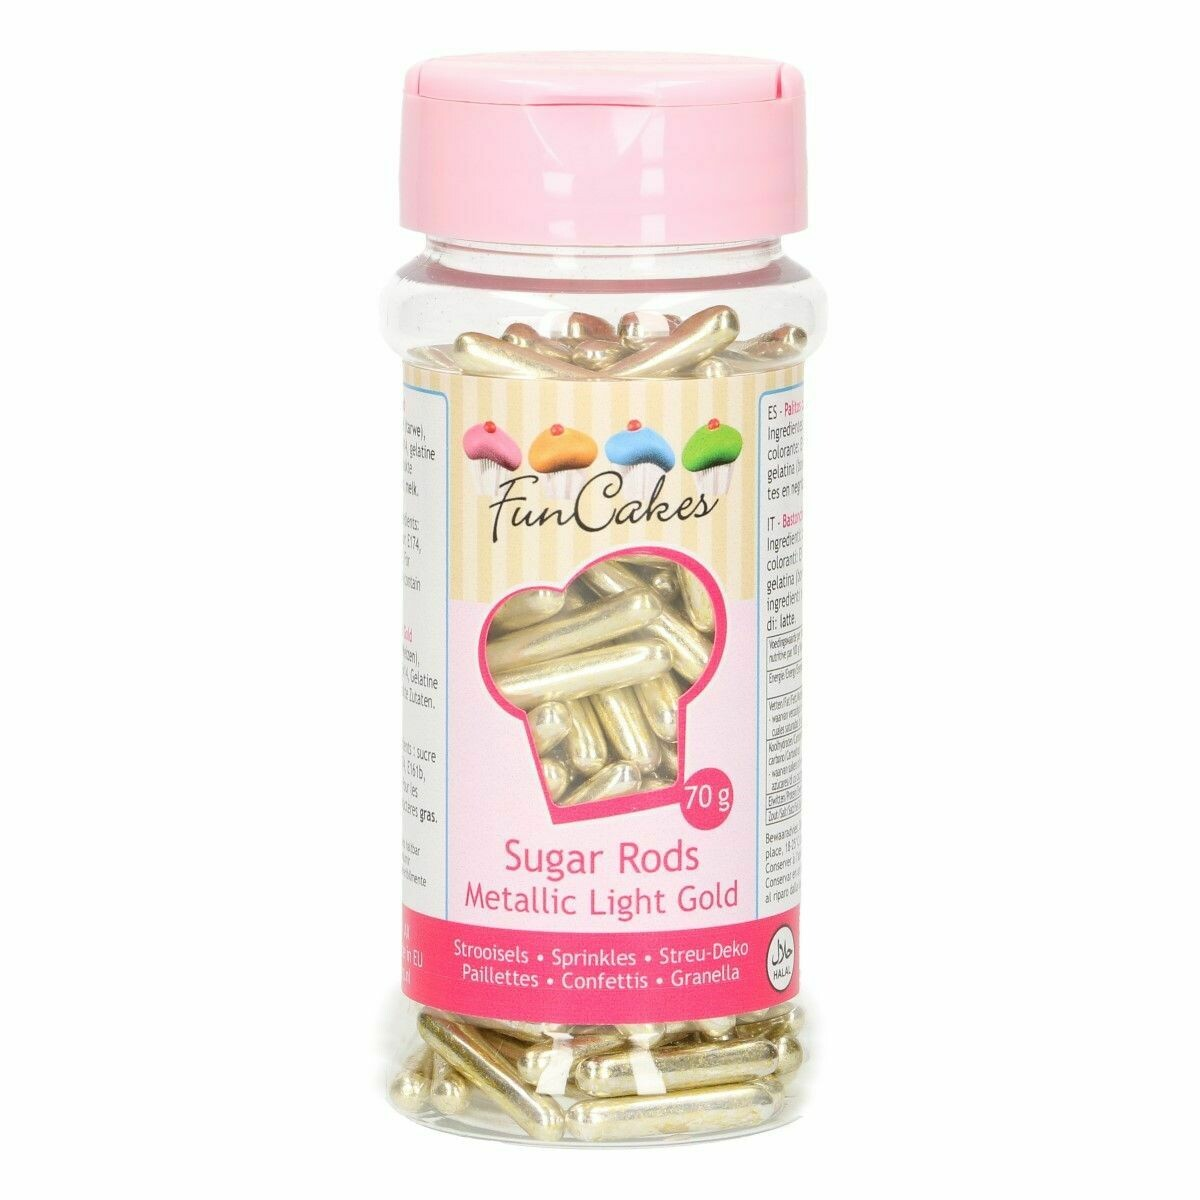 FunCakes Sprinkles -Metallic Sugar Rods XL GOLD -Μείγμα Ζαχαρωτών Ράβδοι -Χρυσοί 70γρ